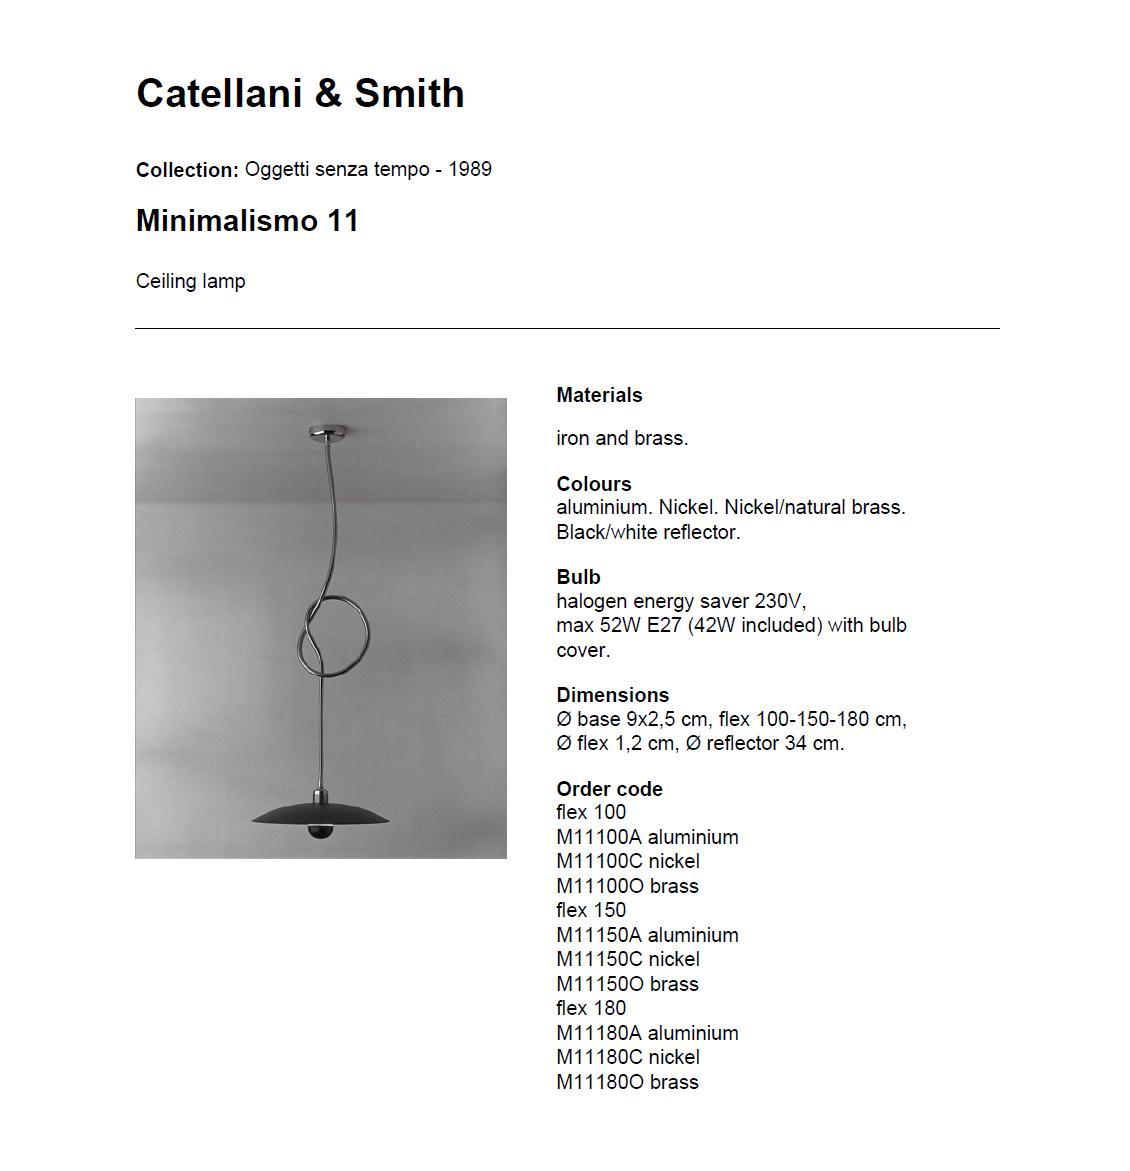 Minimalismo 11 Plafón Flex 180 Níquel Catellani y Smith Foto